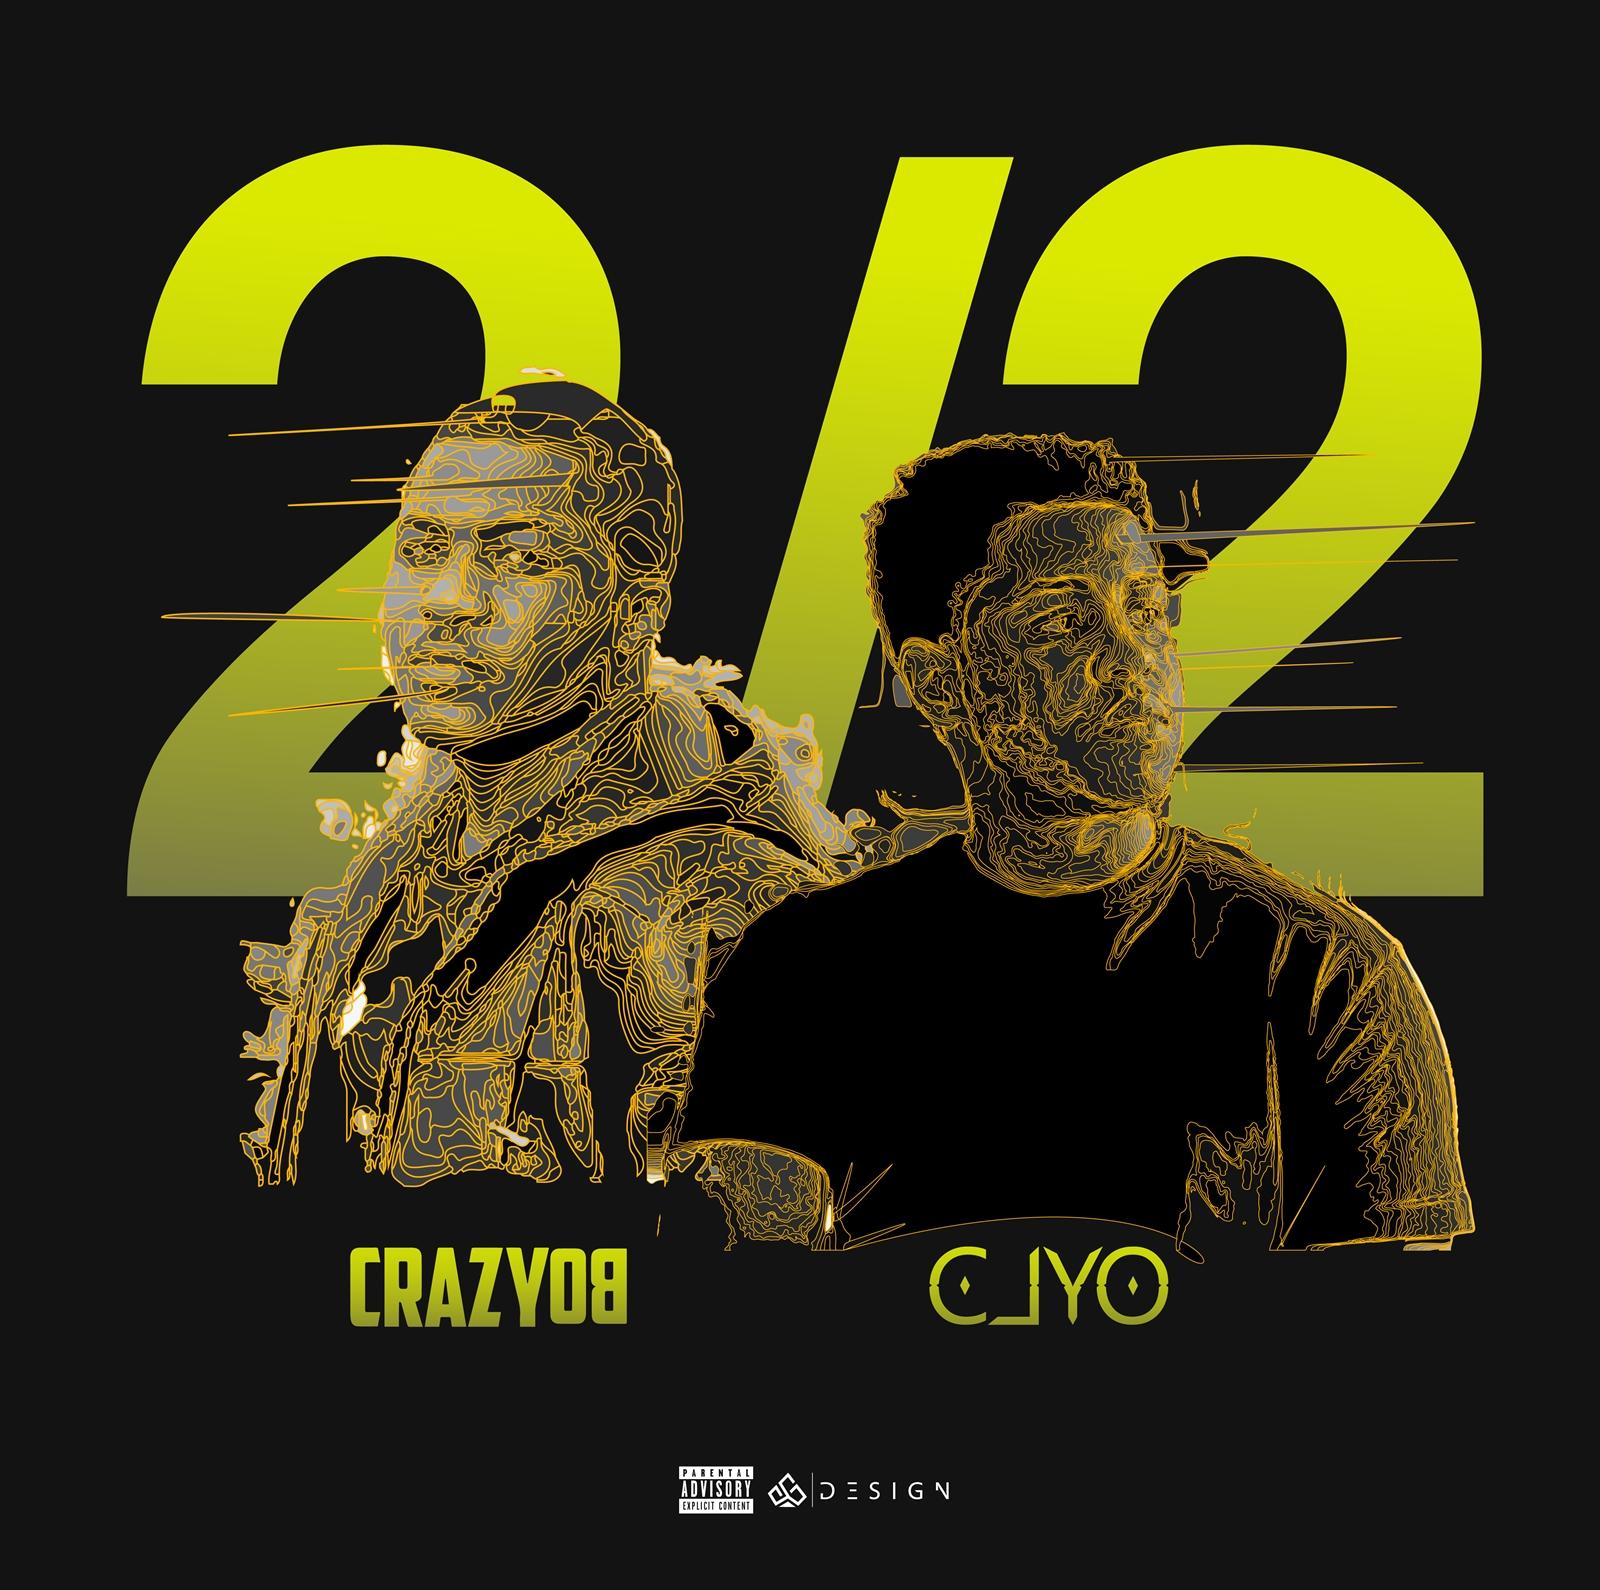 Clyo & Crazy Boy - 2 de 2